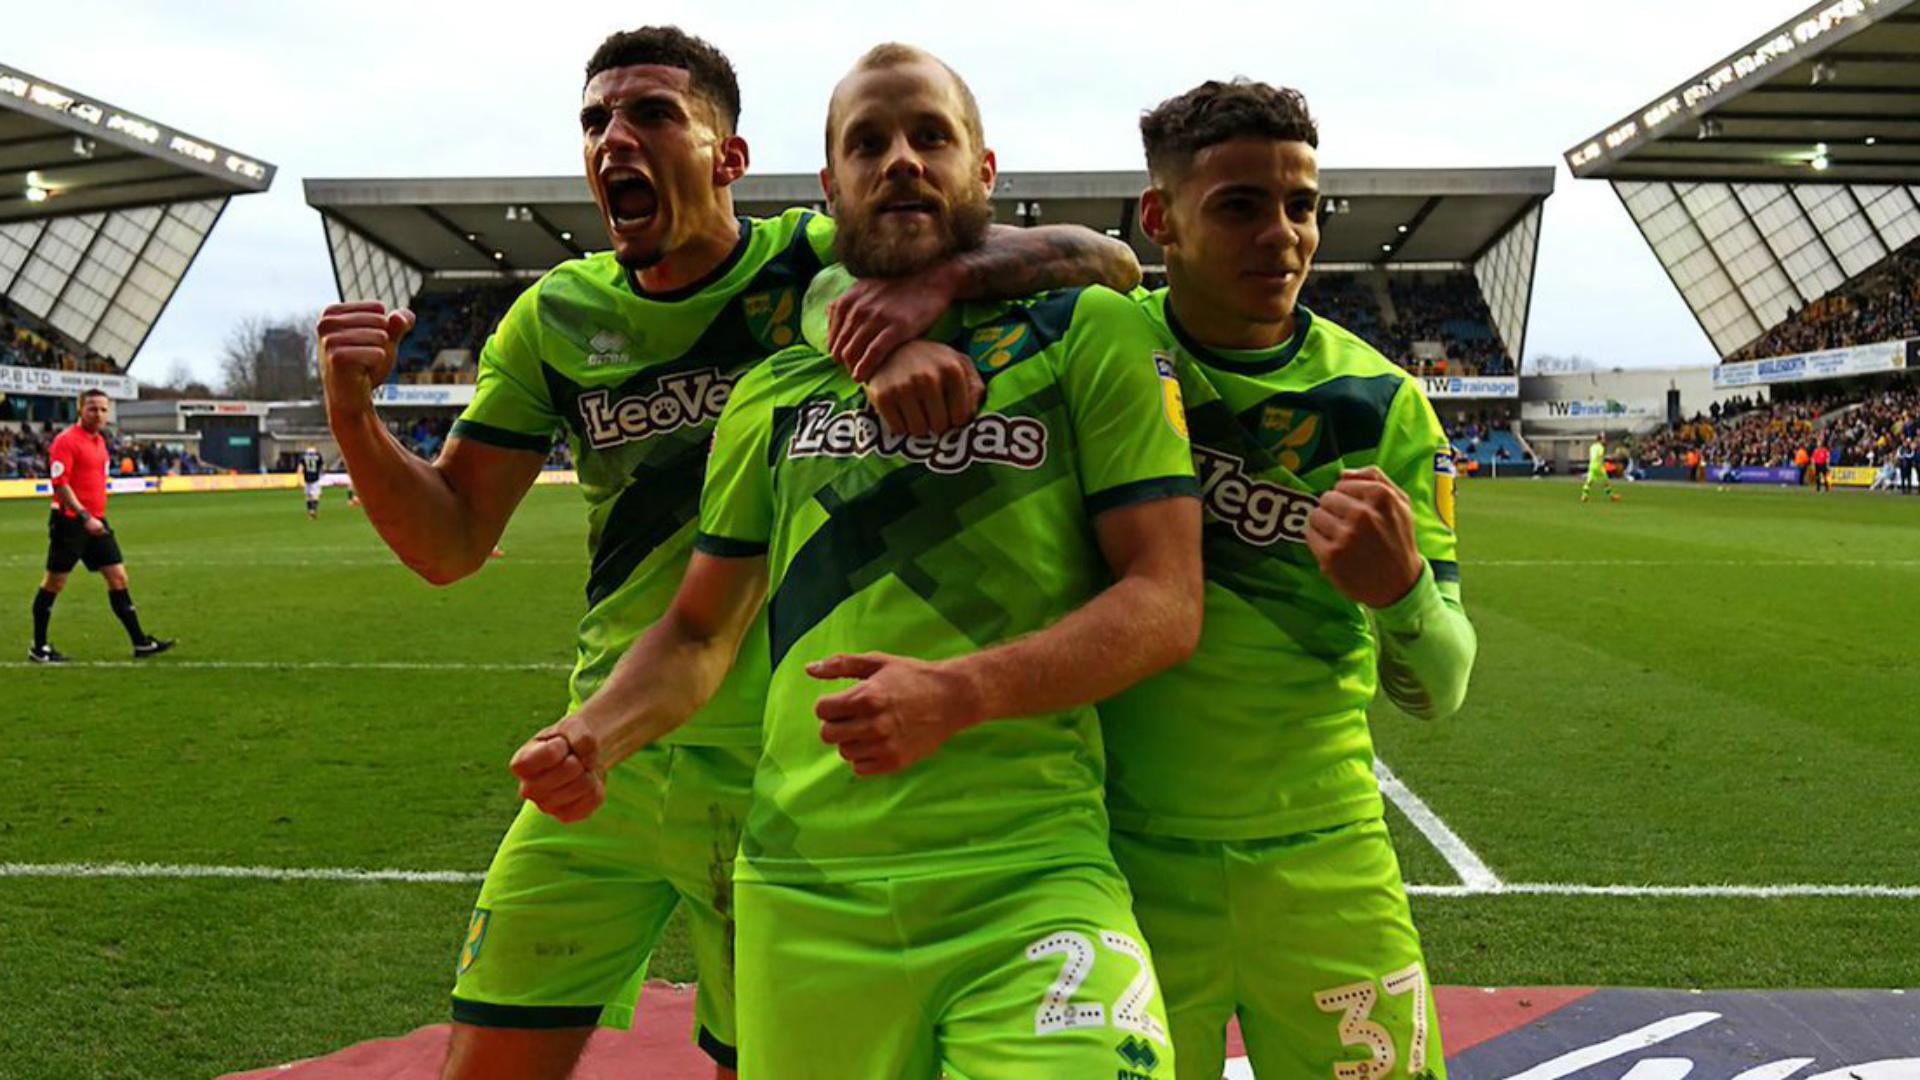 Championship Review: Norwich back on top as Aston Villa thrash Derby